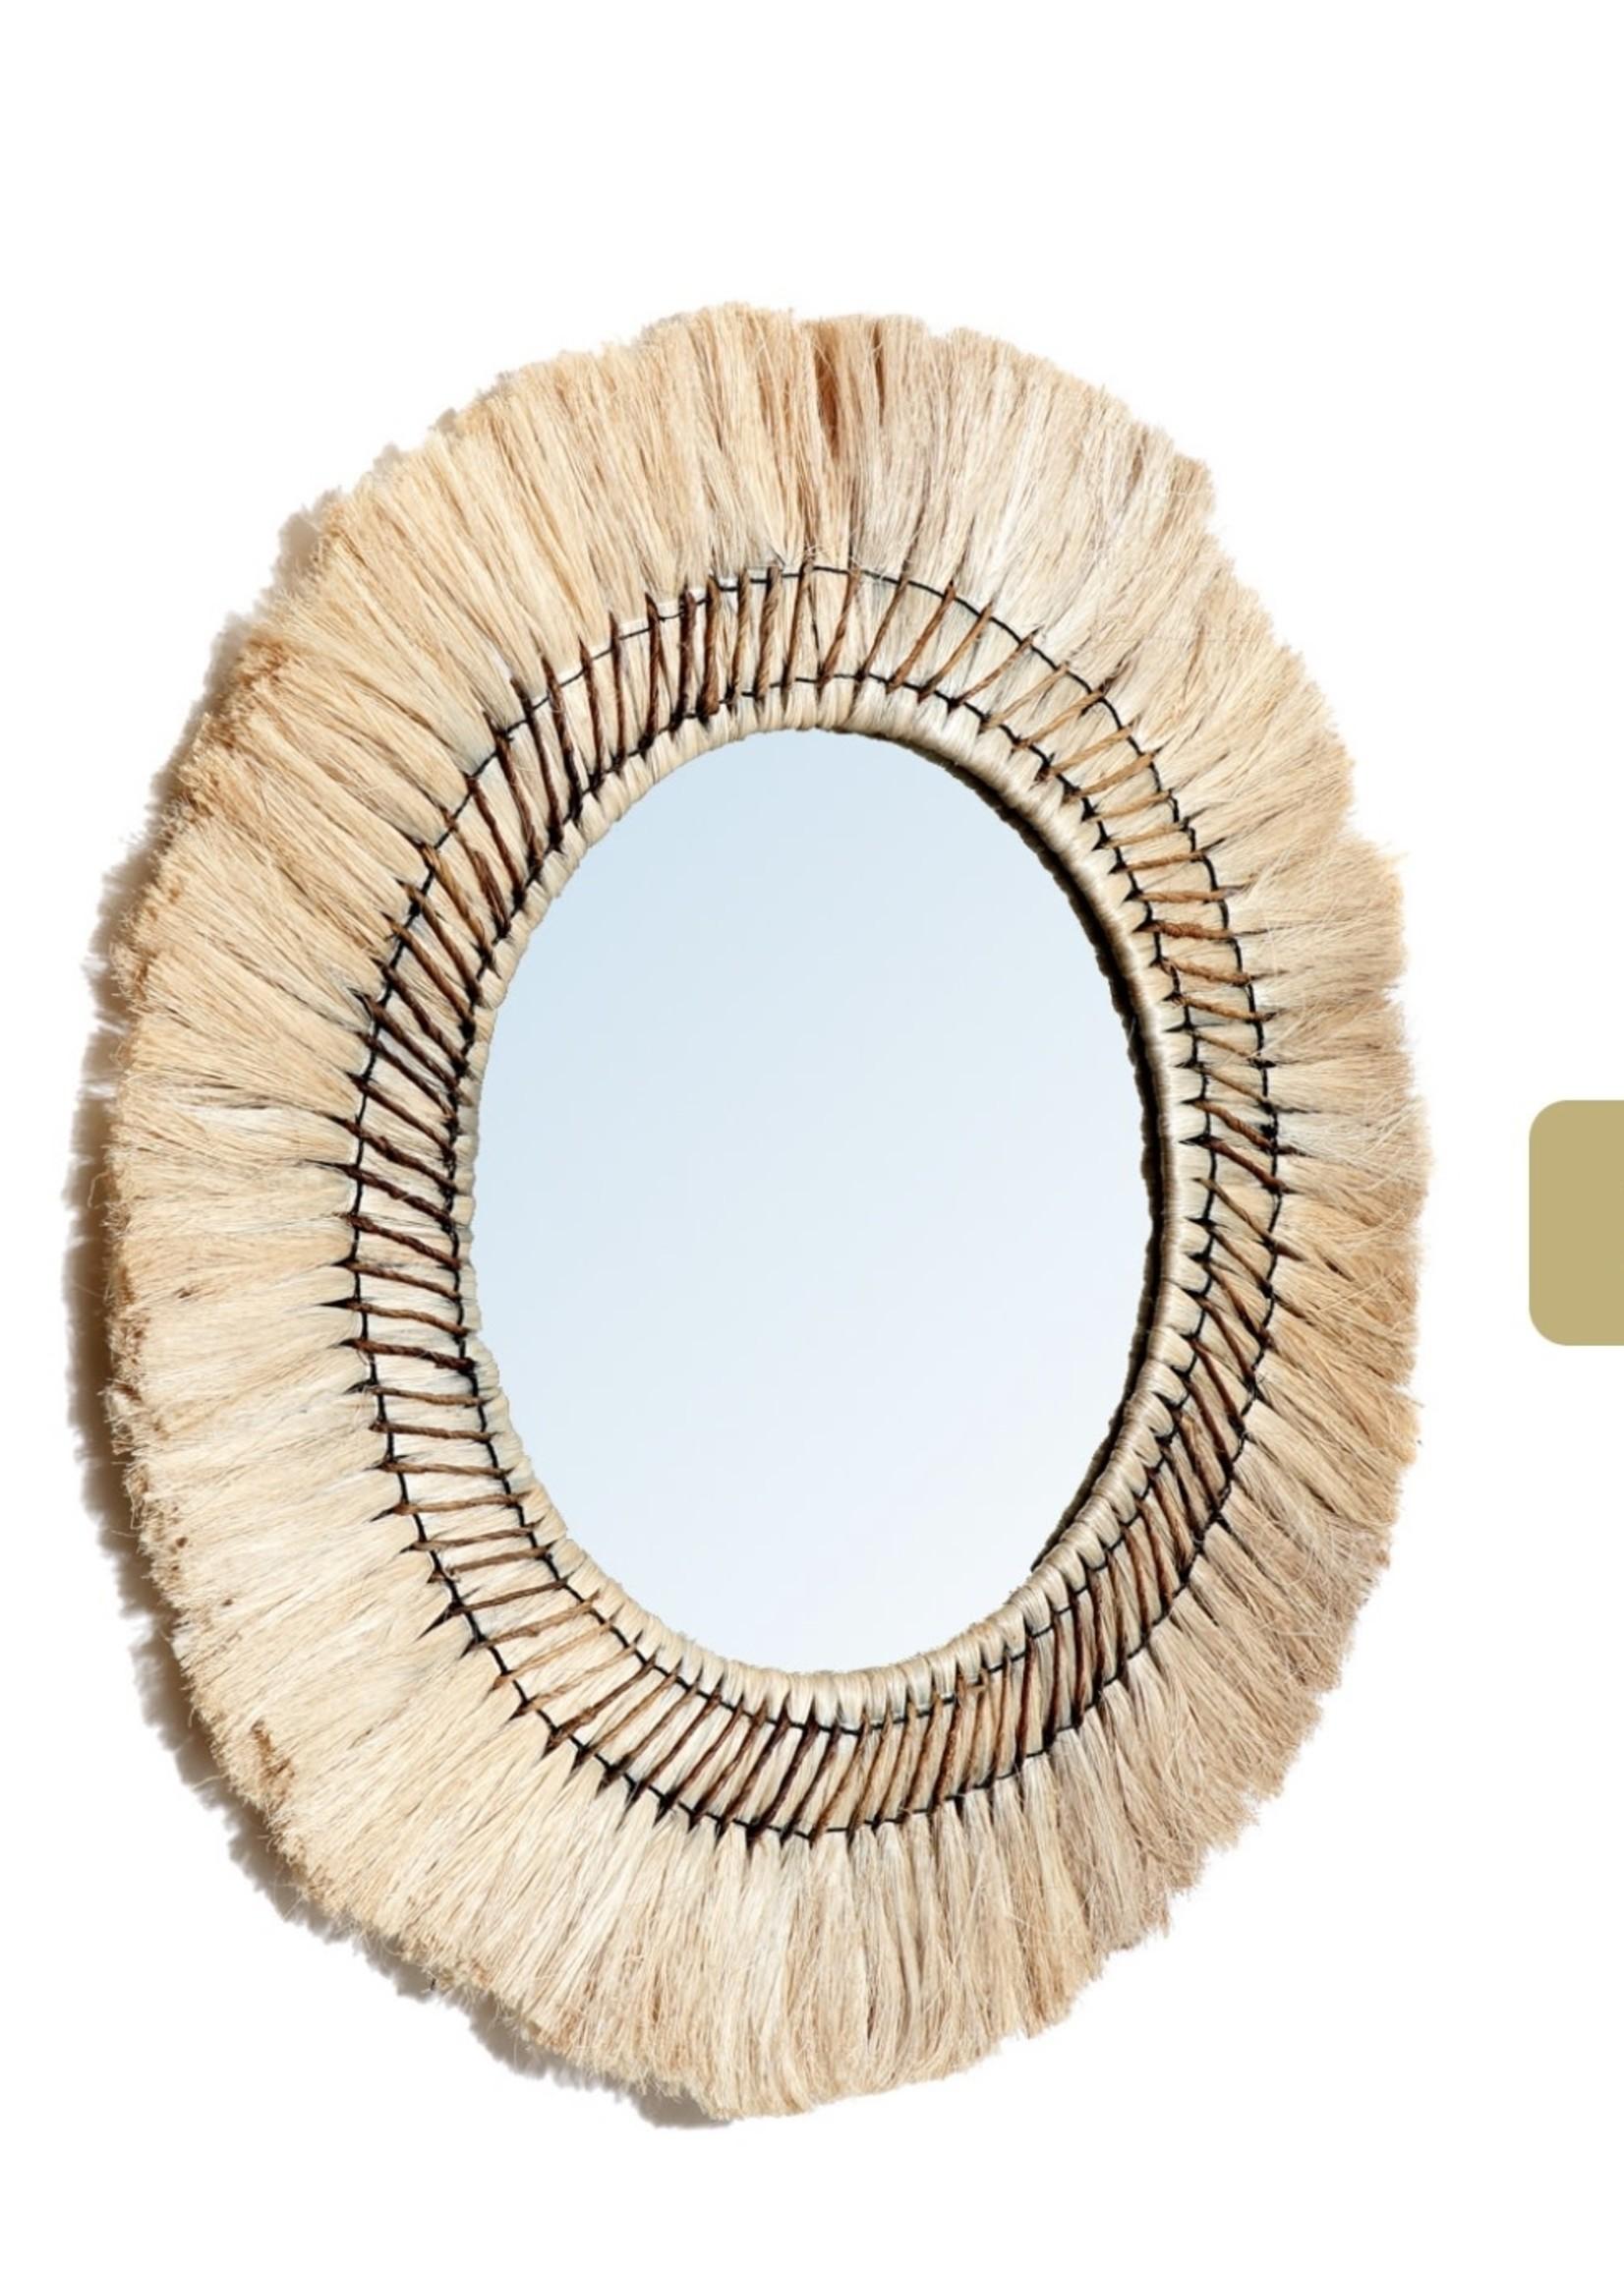 Guts & Goats The Pretty Blonde Mirror